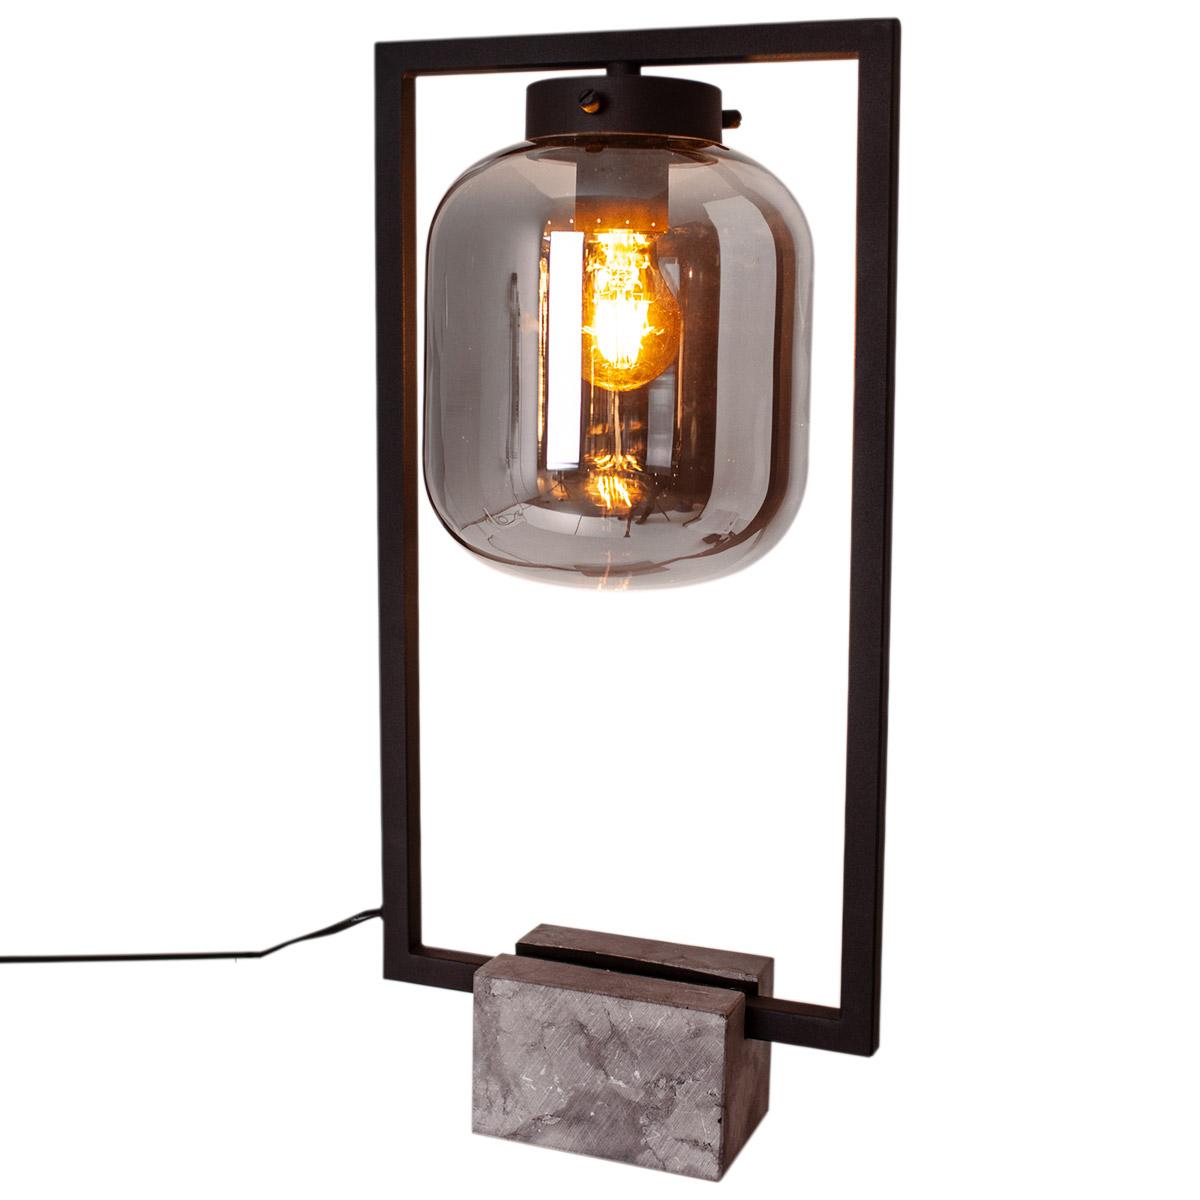 By Rydens Dixton bordlampe H52cm